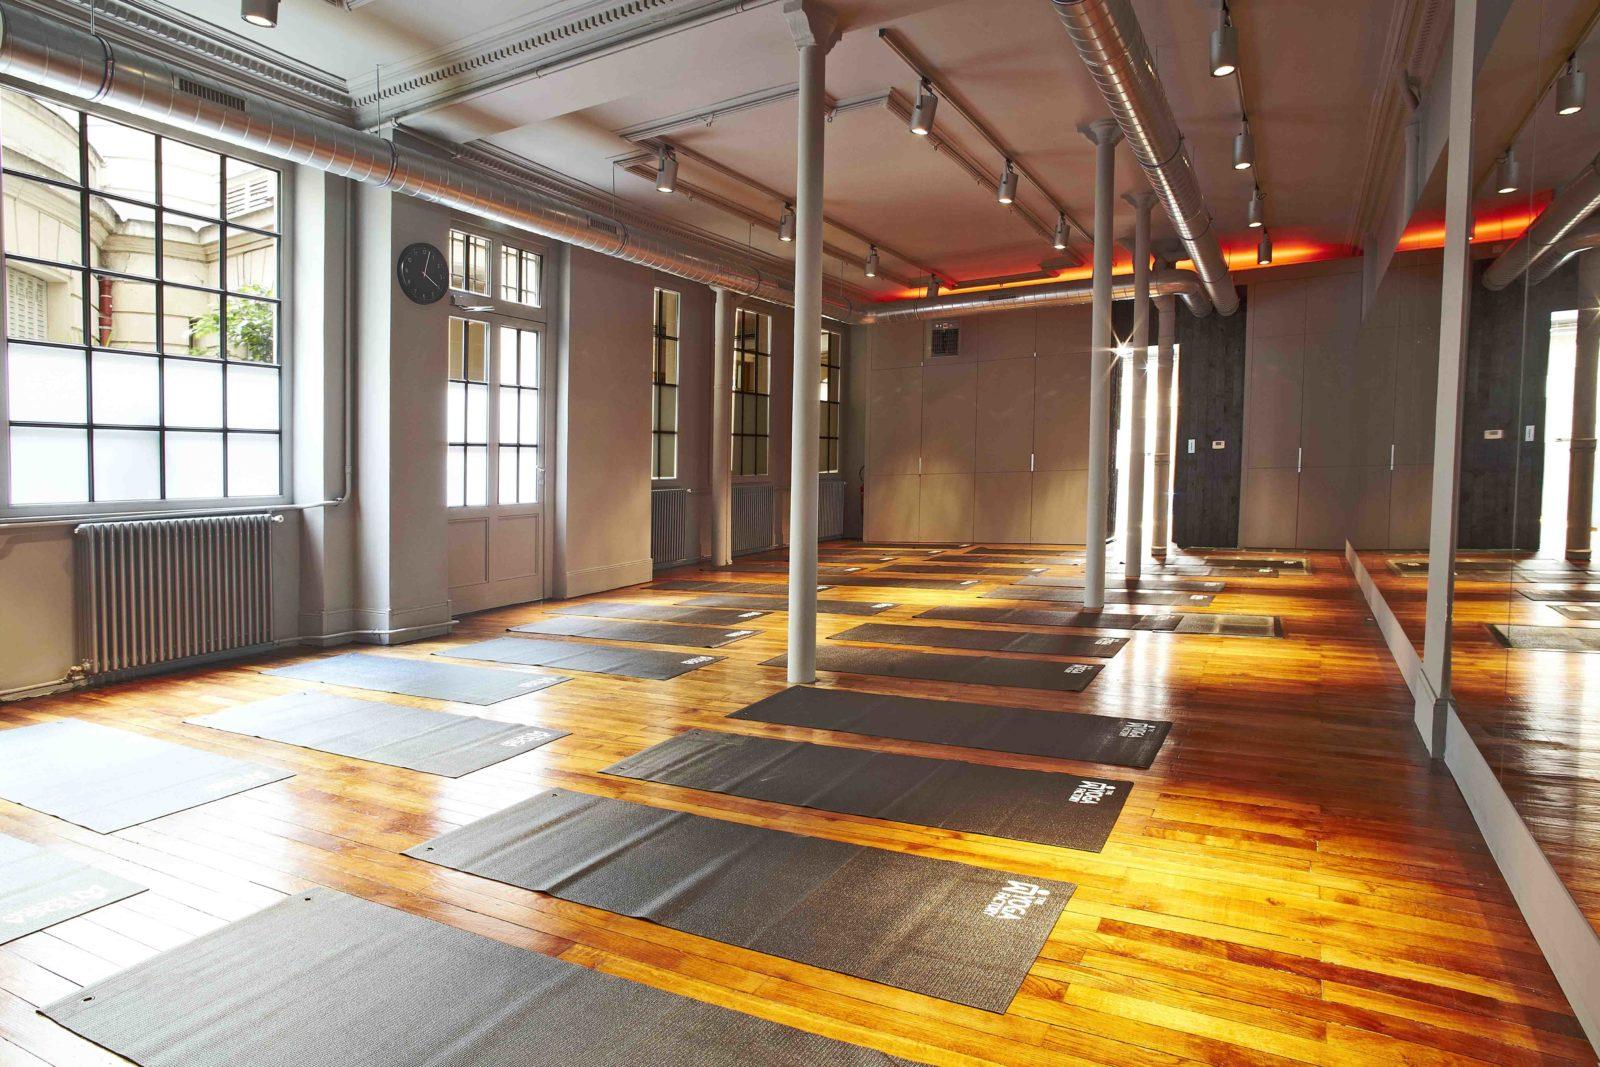 From Bikram to Vinyasa Flow: Paris' Best Yoga Studios